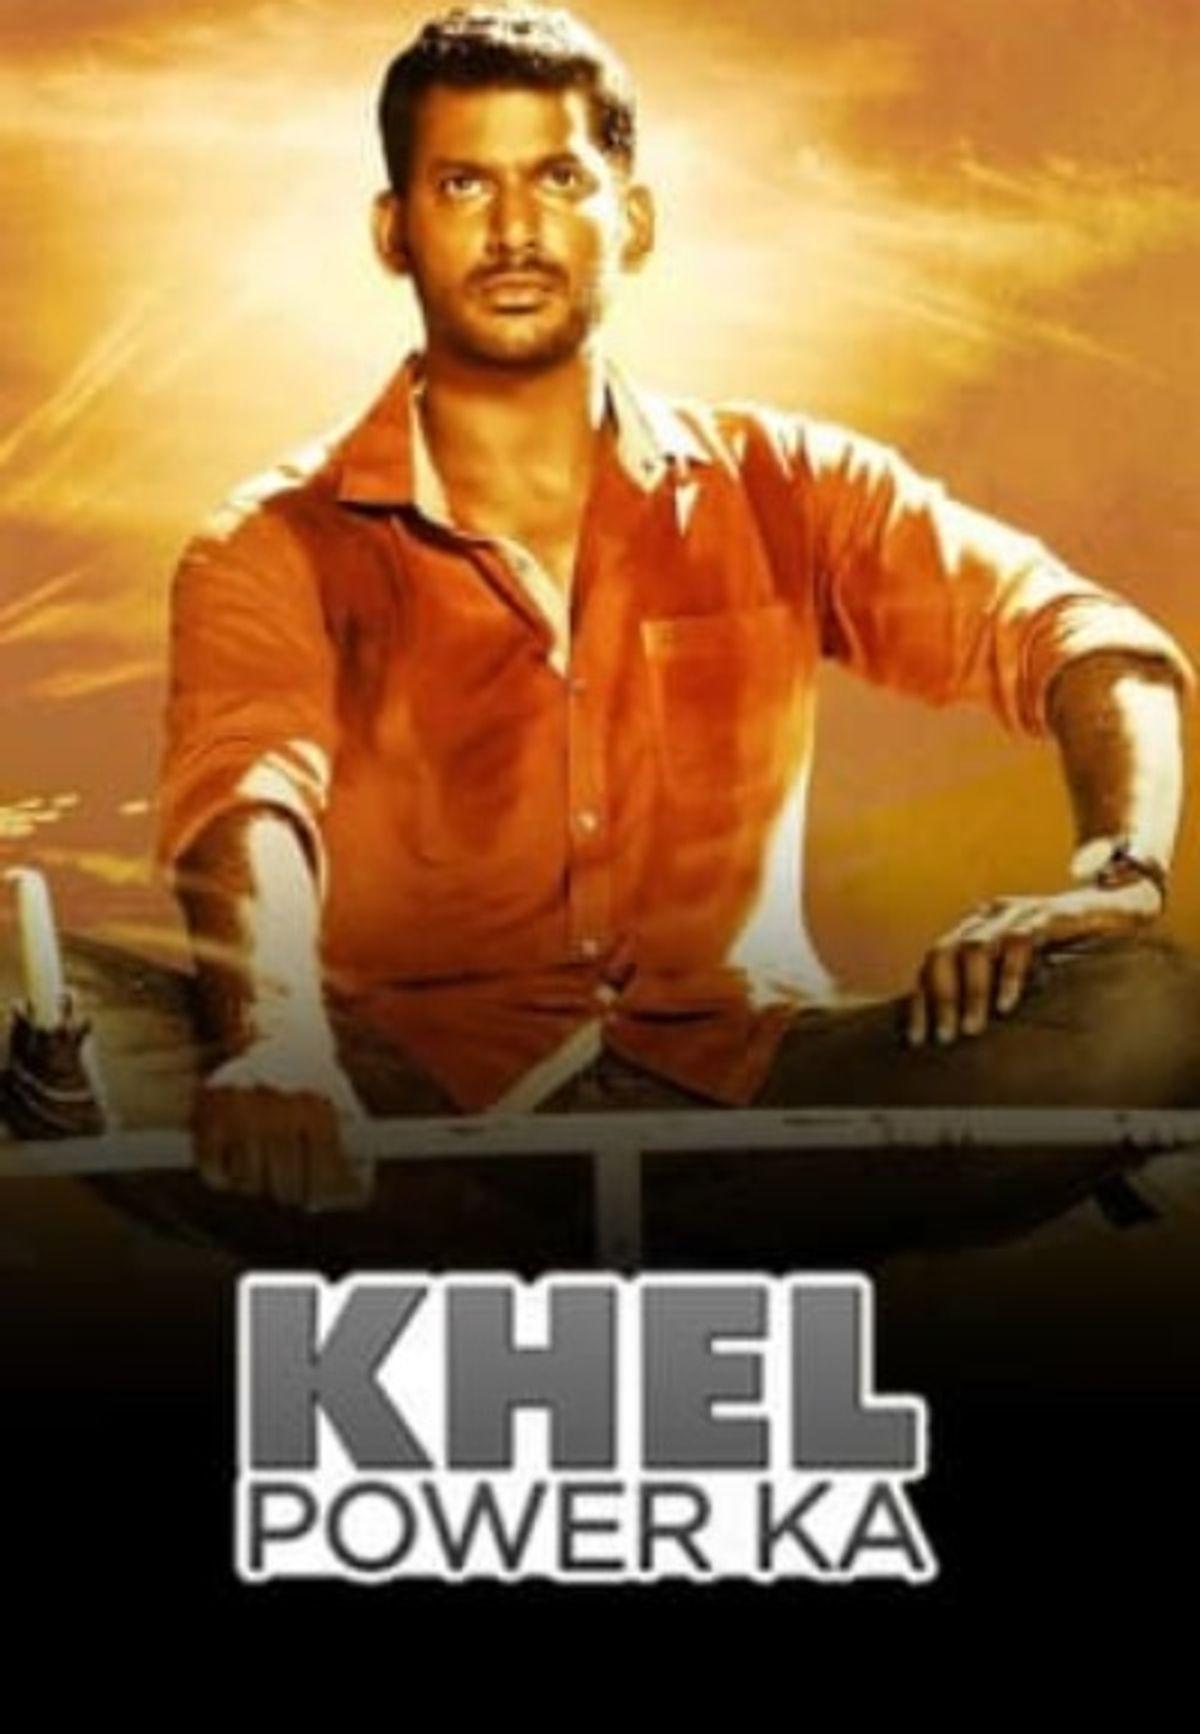 Khel Power Ka